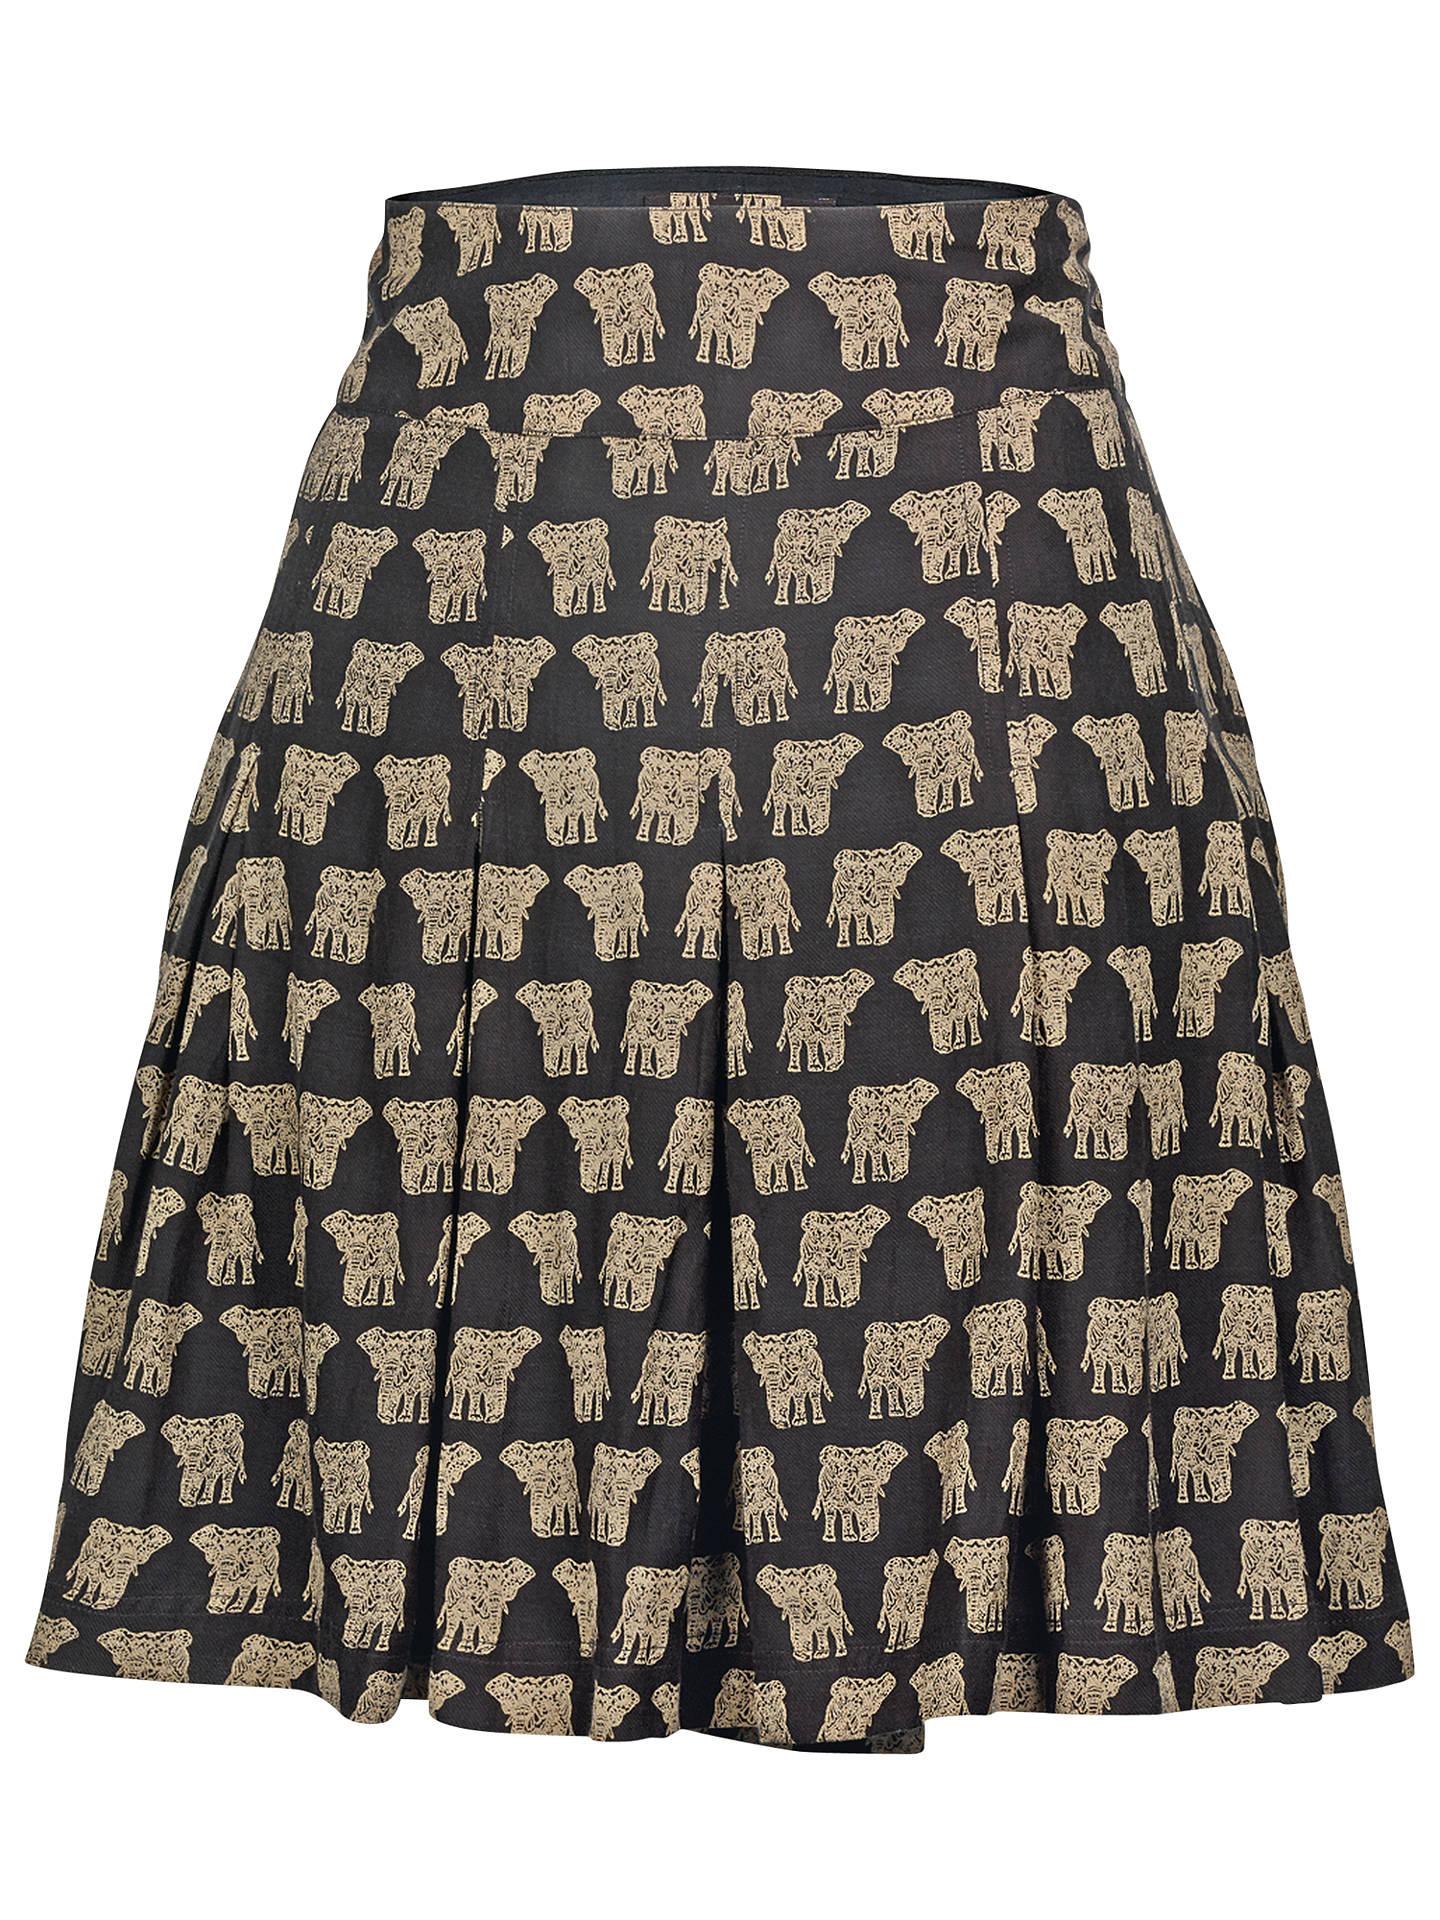 18383c3fe1 Buy Fat Face Pleat Elephant Cotton Skirt, Phantom, 6 Online at  johnlewis.com ...